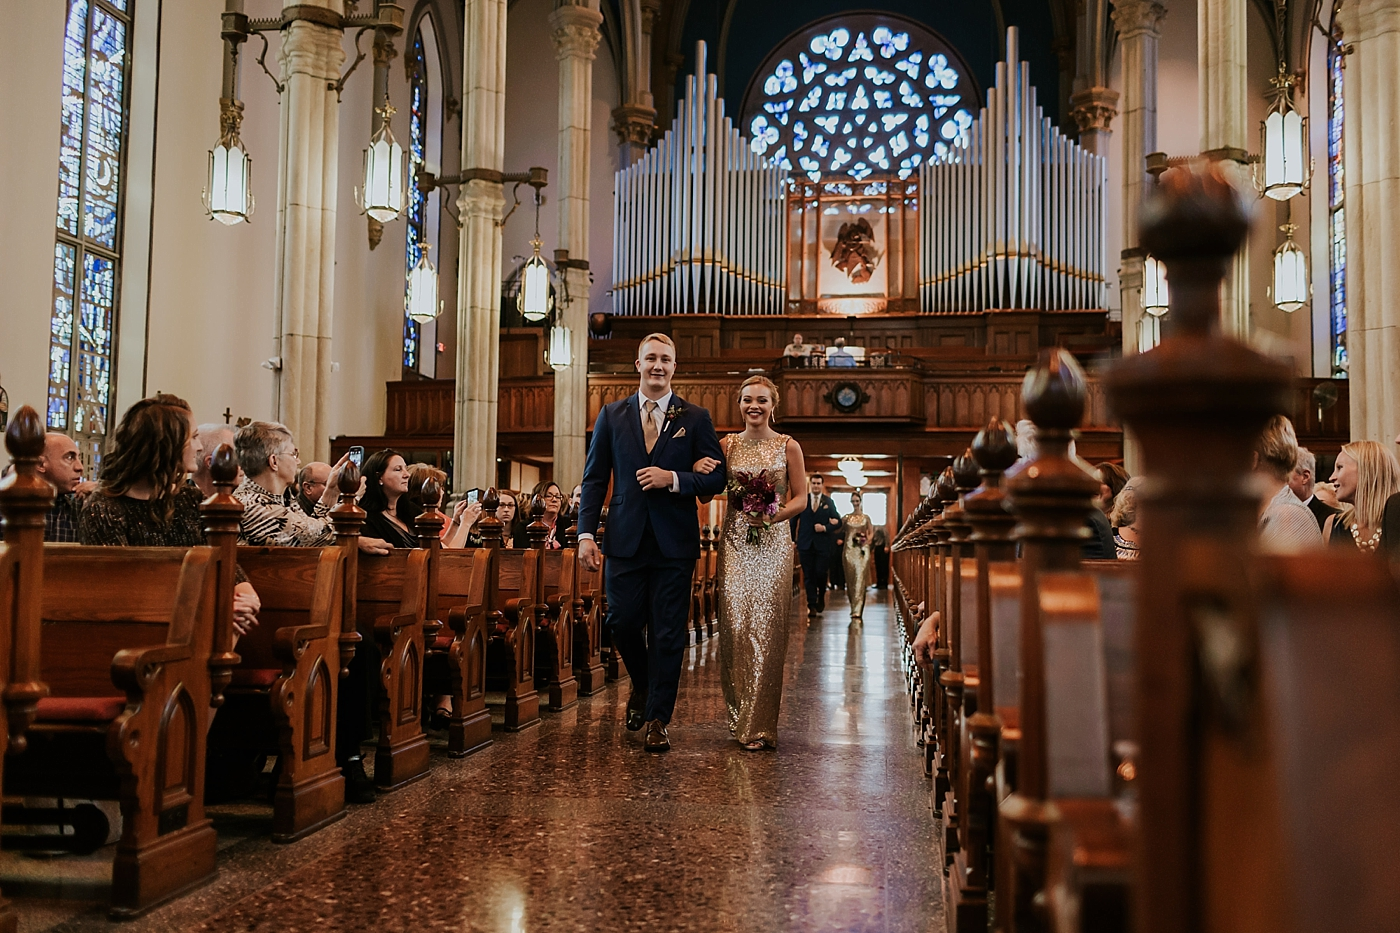 Ohio-Wedding_Kathryn+Devin_MJPHOTO2017-331.jpg